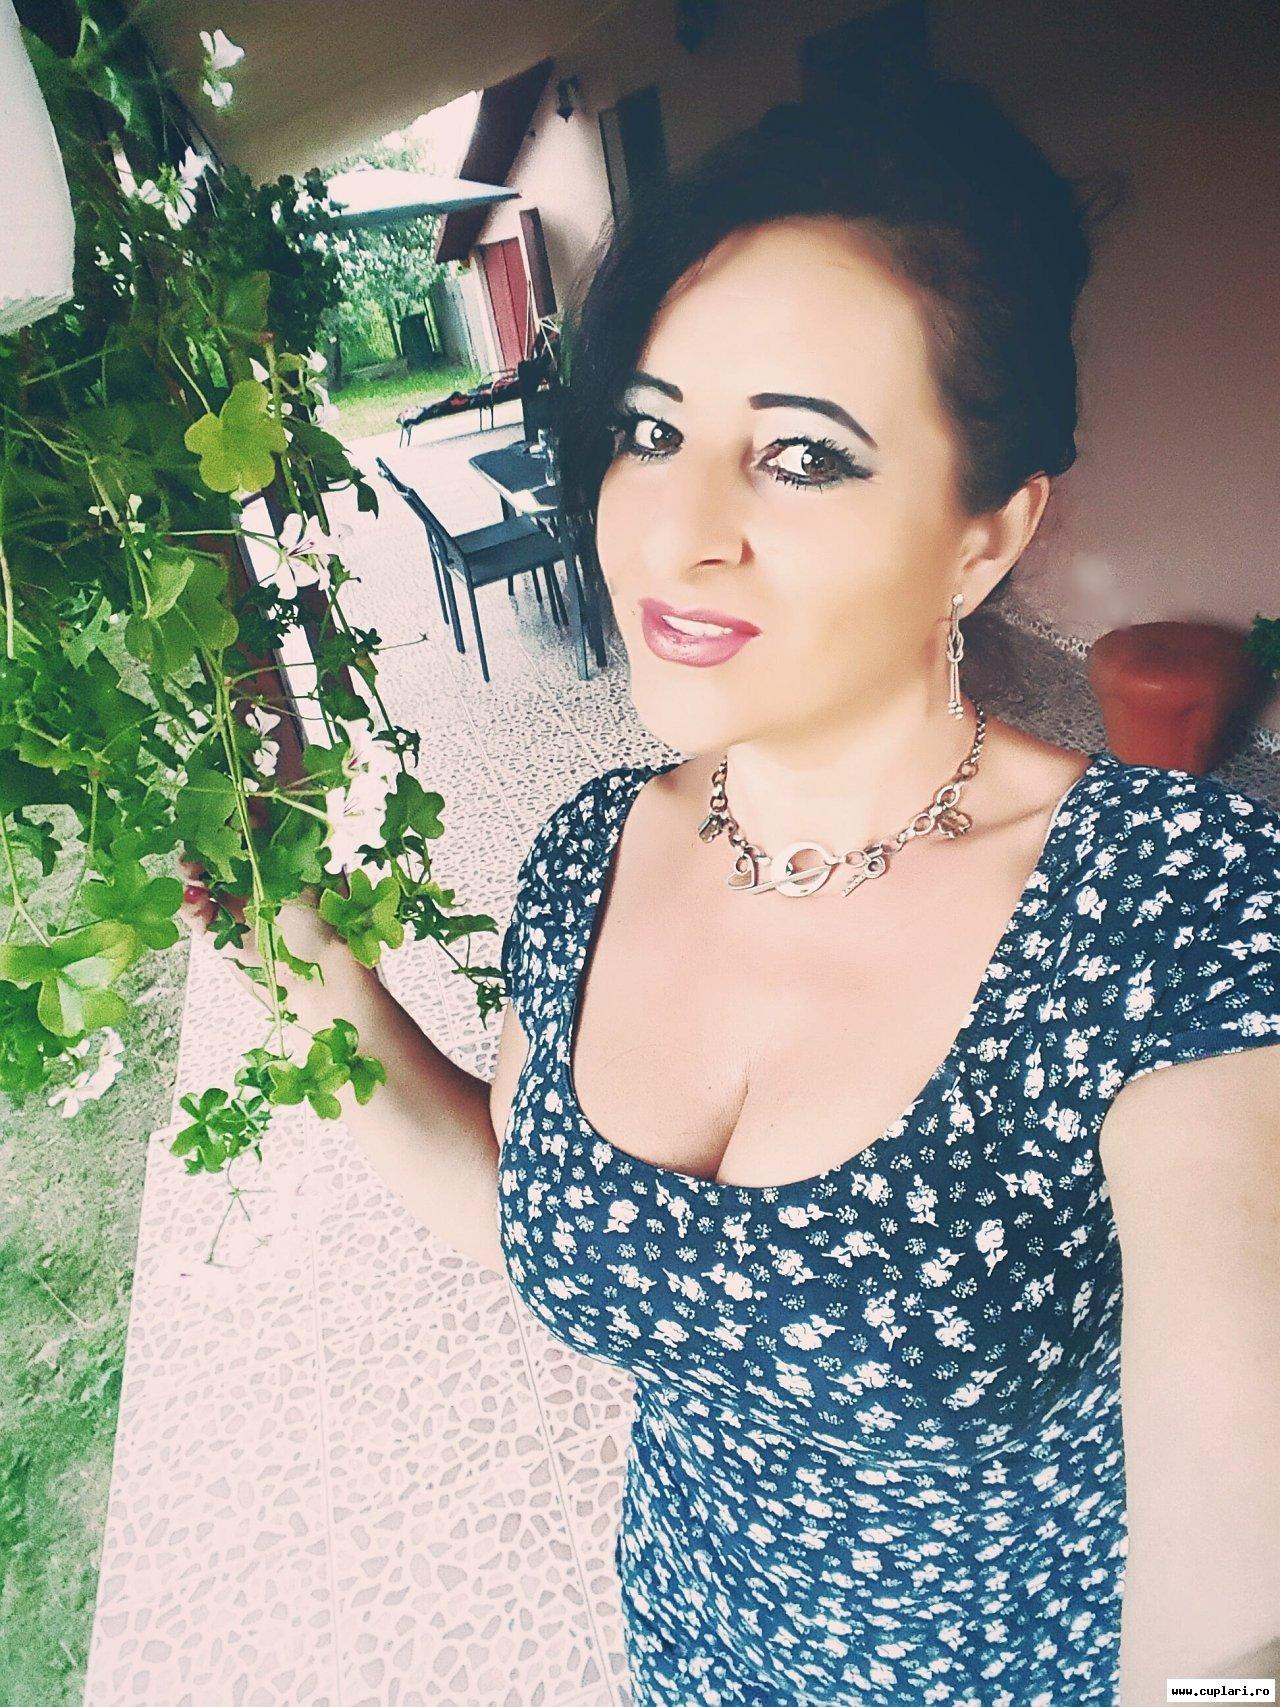 matrimoniale casatorie femei caut barbat singur sibiu — reserver ditt hotell i sibiu online